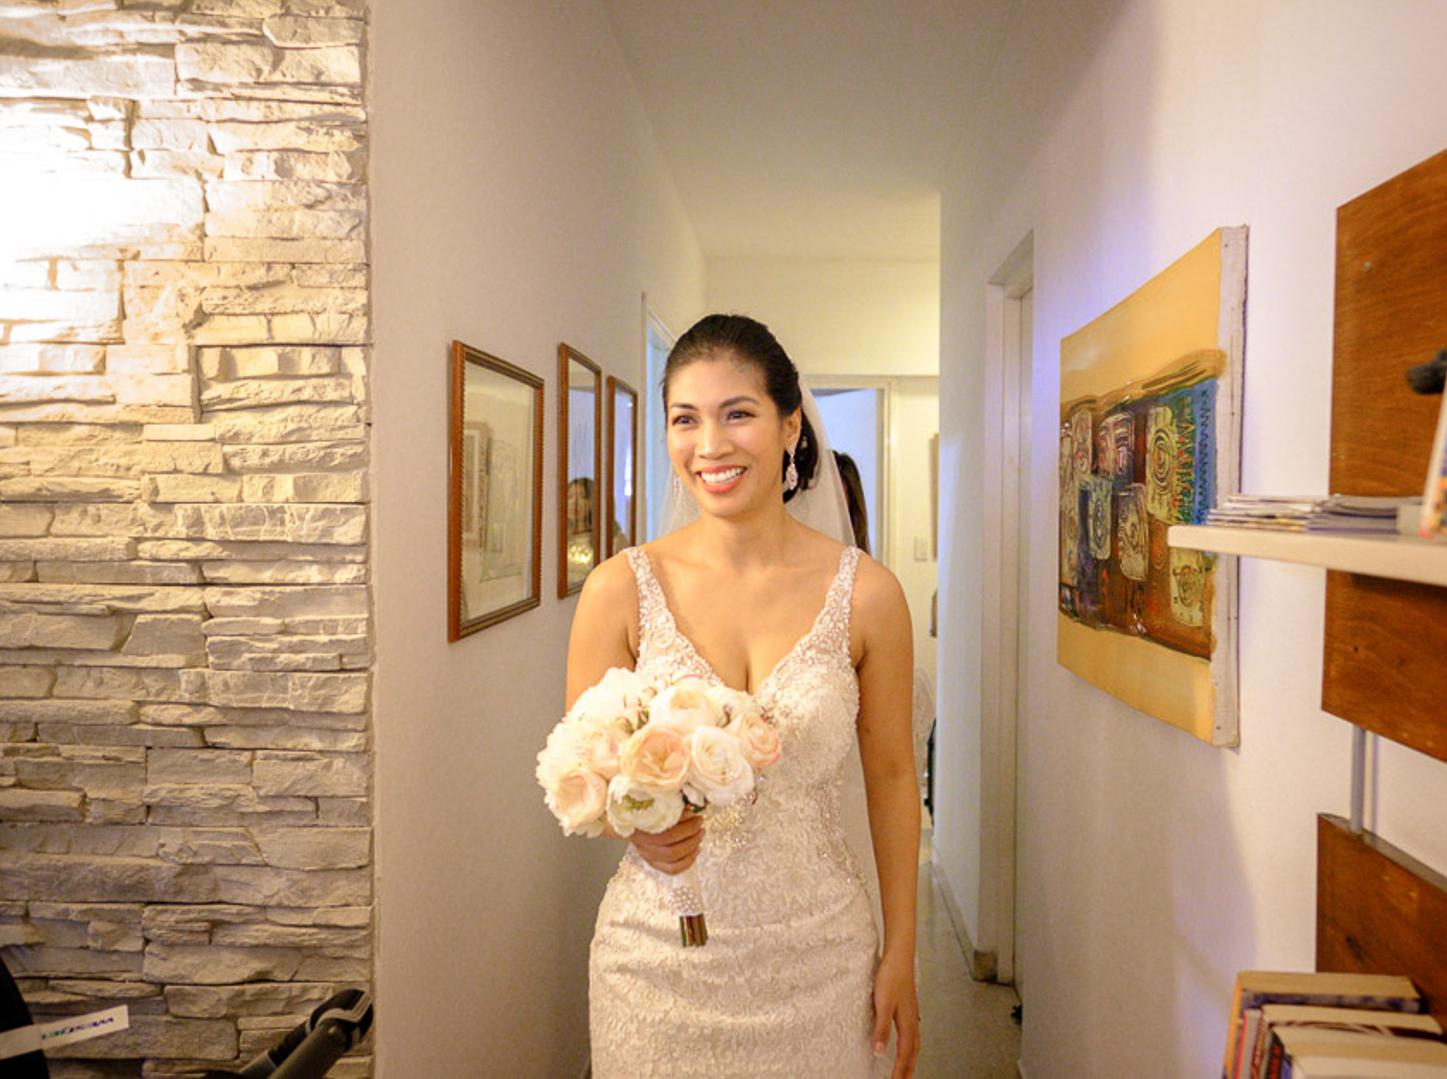 bodas-sin-clasificar-sin-tema-cuba-41082.jpg